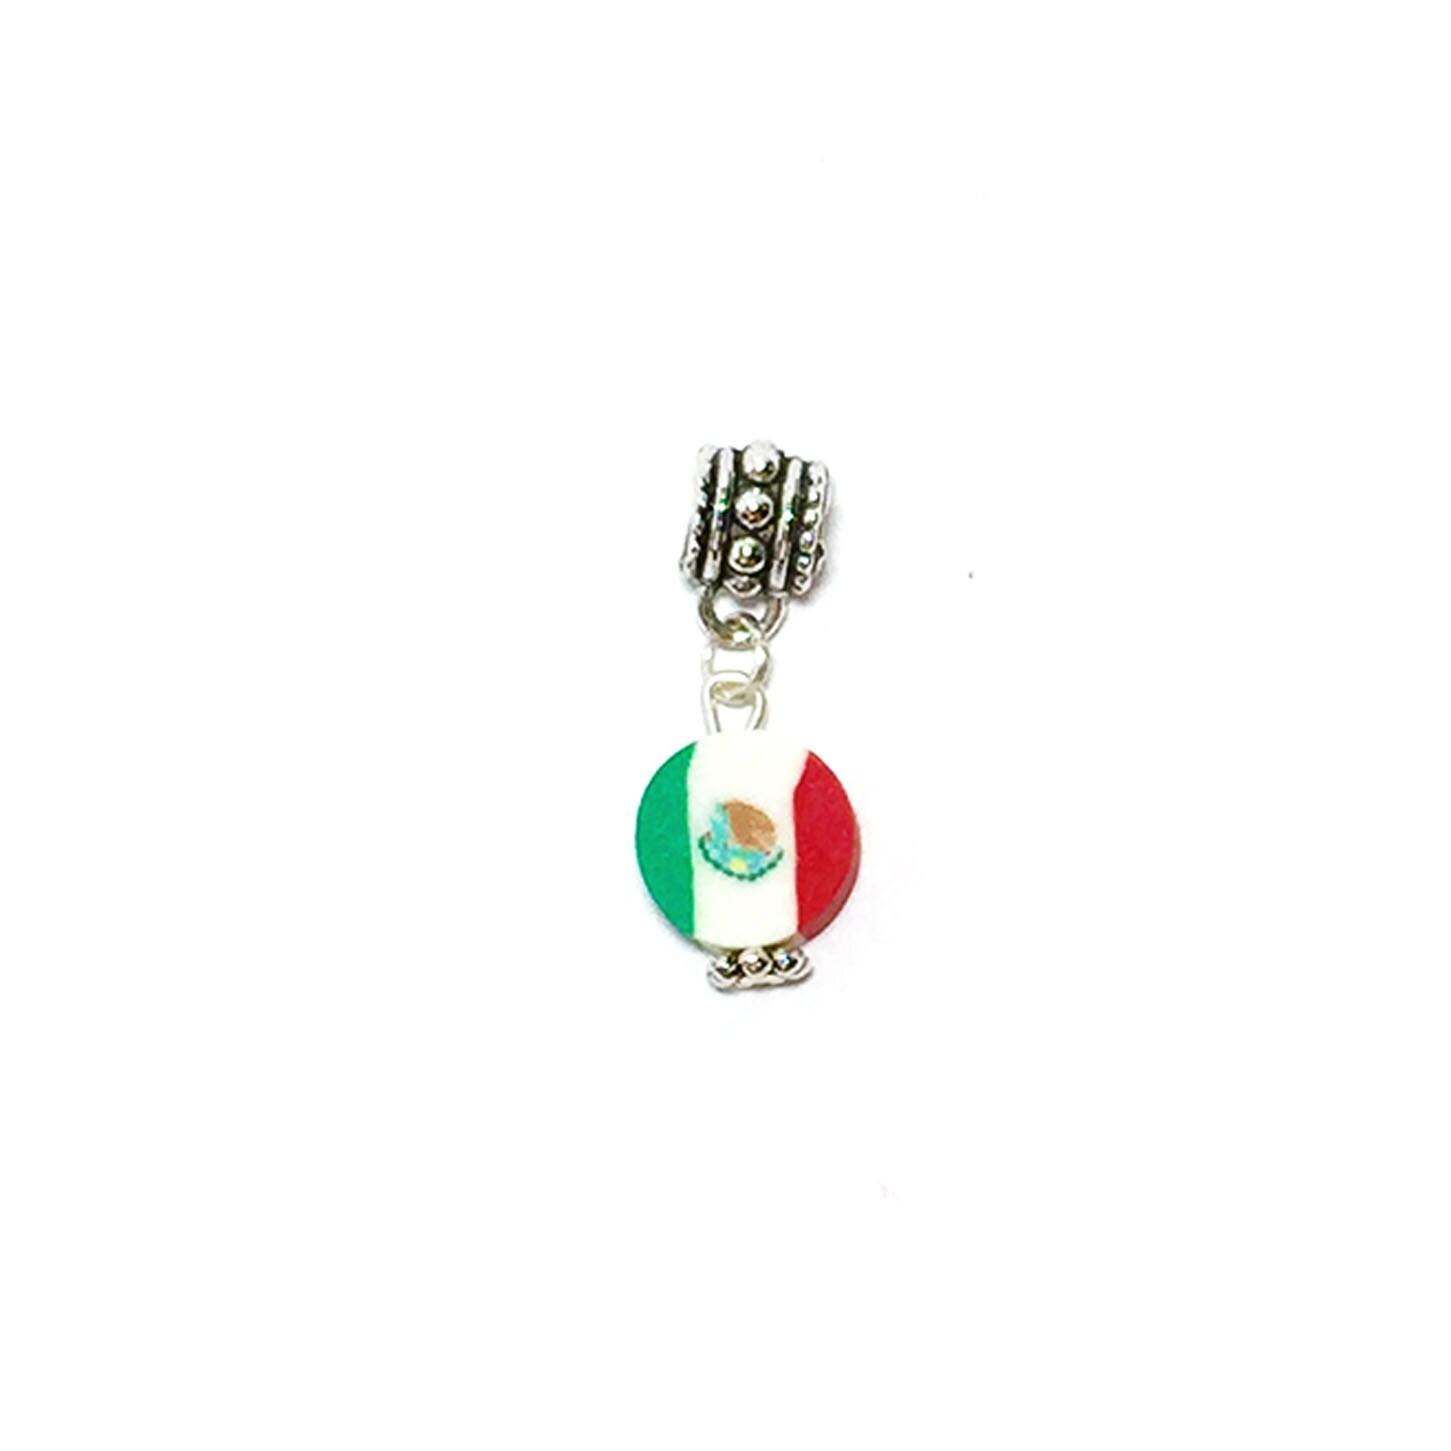 Mexico Flag, European Charms for bracelets, fits Pandora bracelets